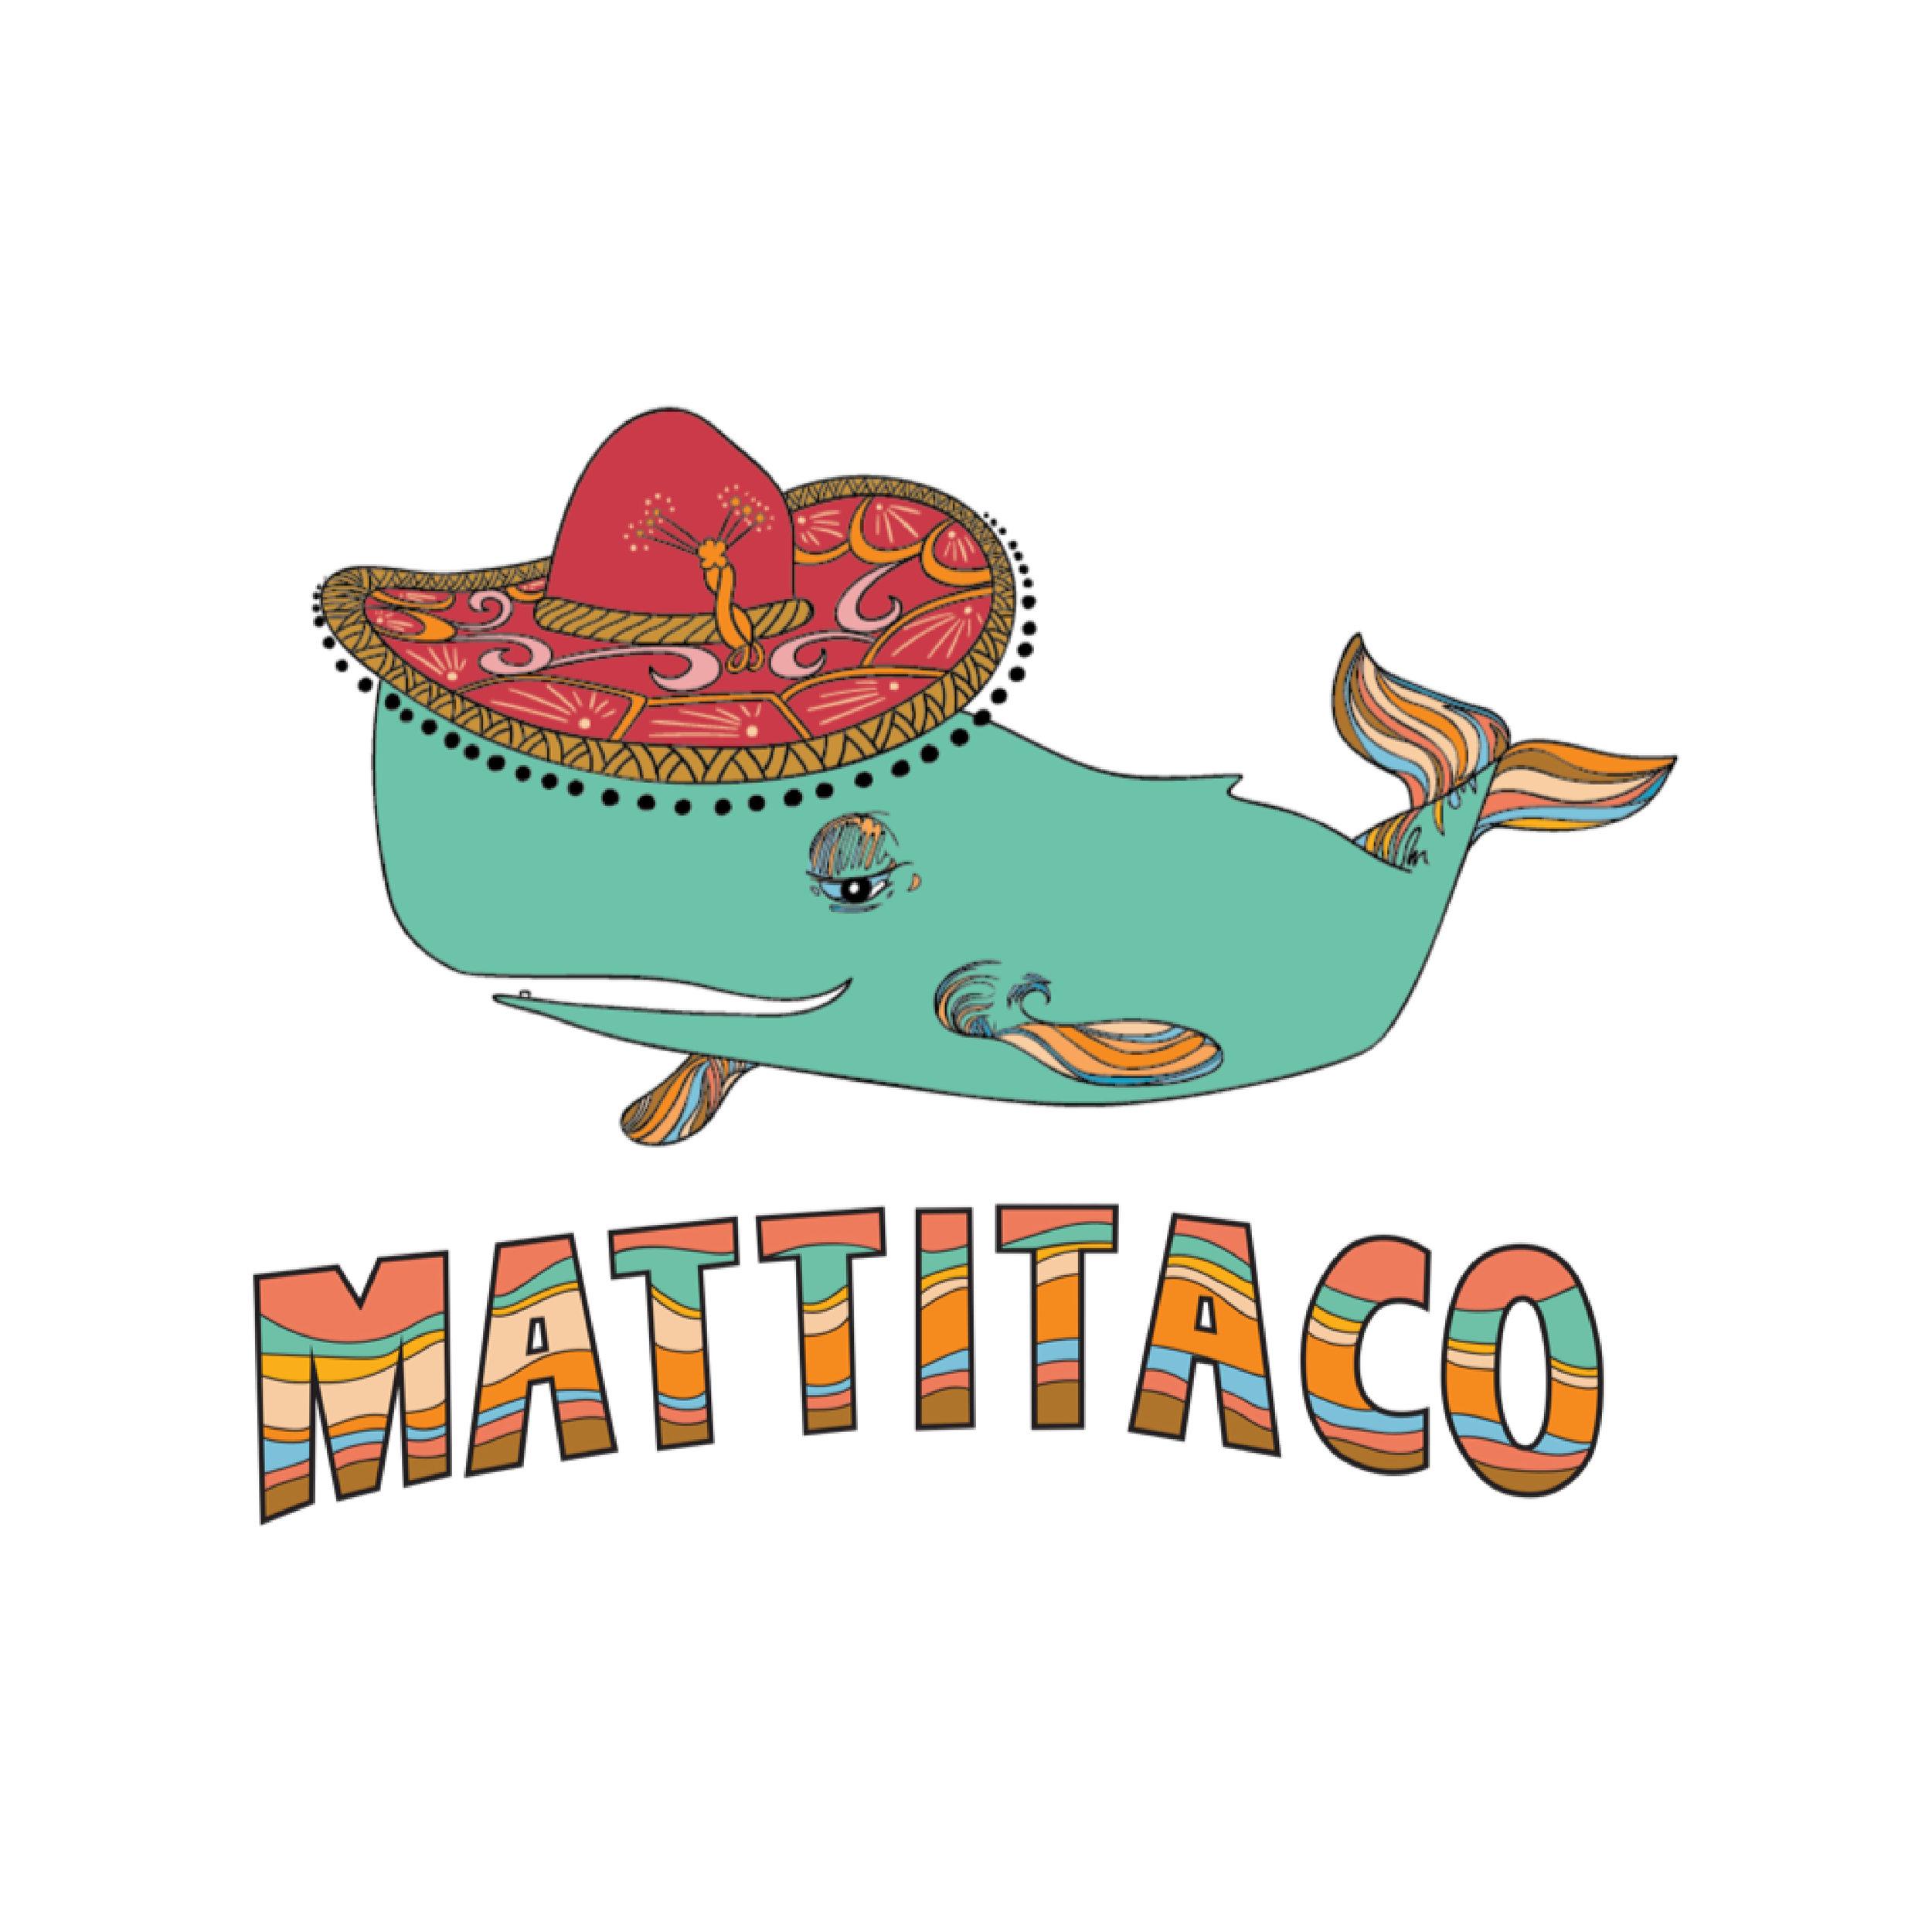 Mattitaco-01.jpg